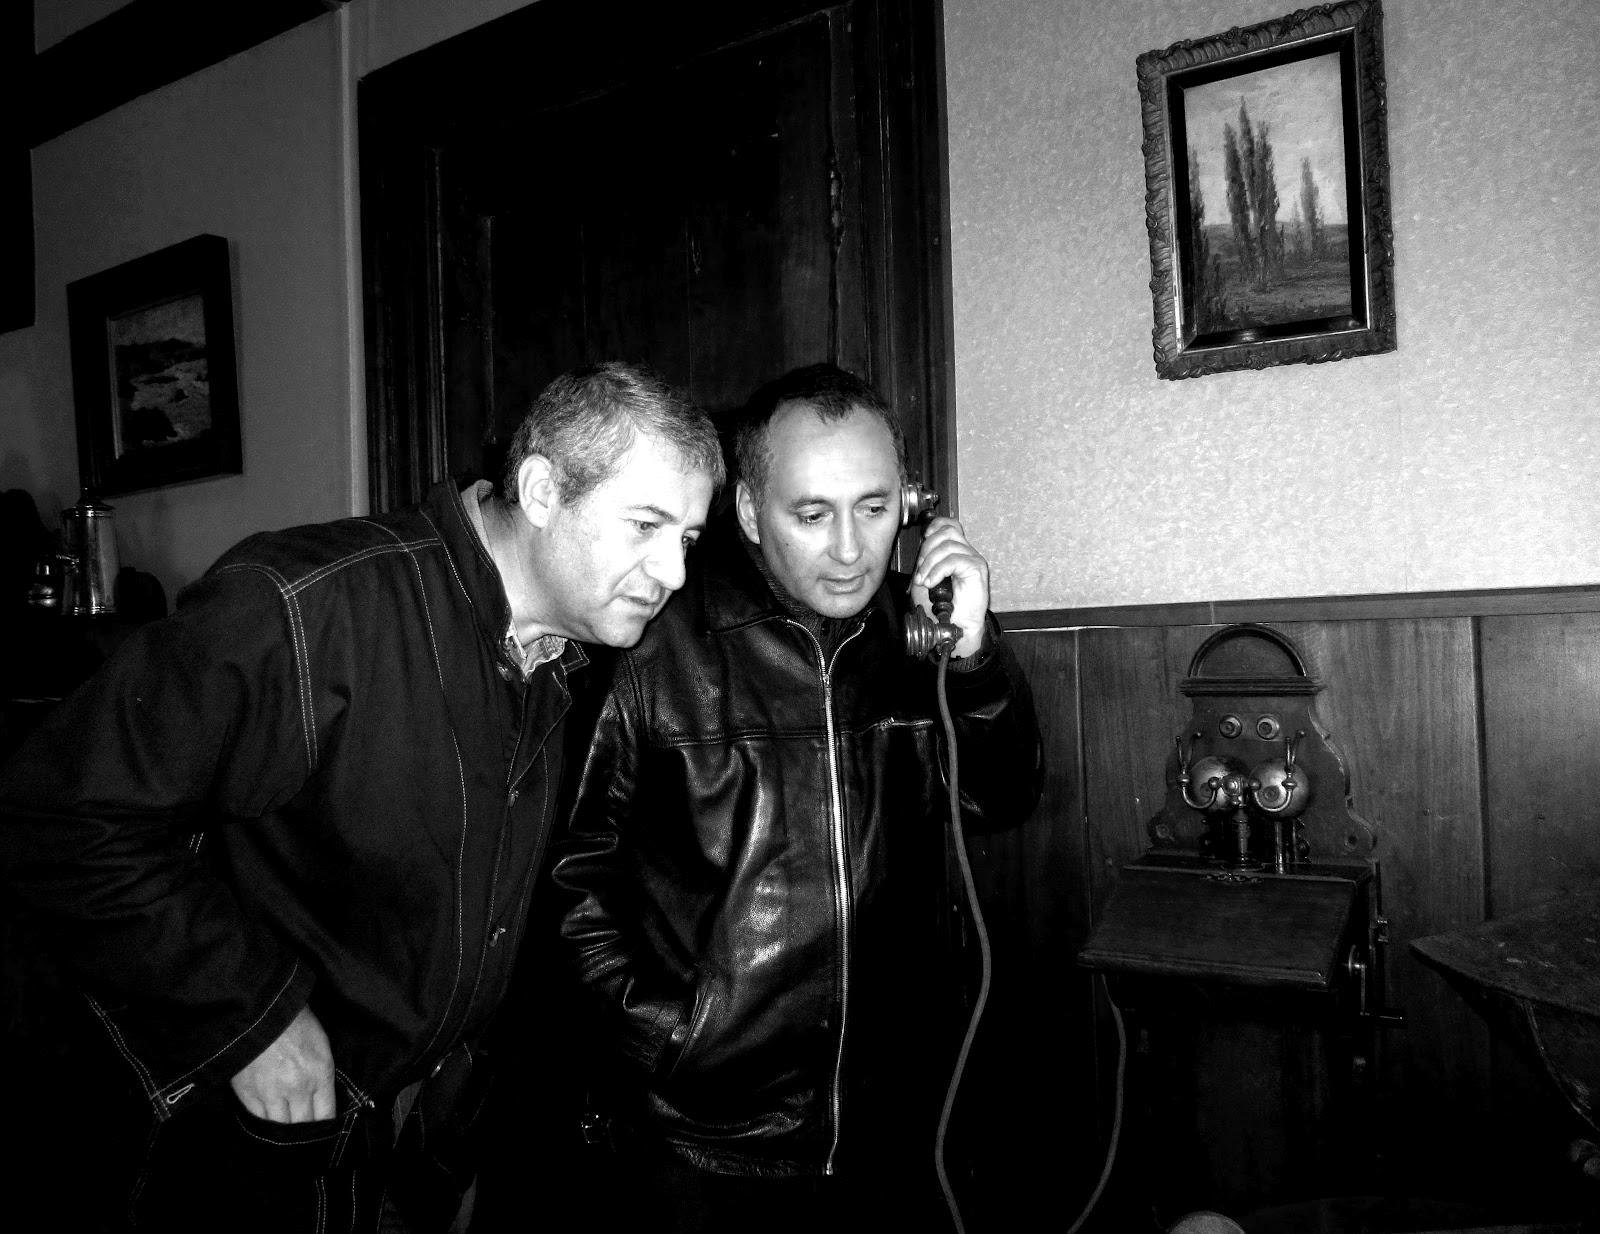 http://2.bp.blogspot.com/-WfM1OWJ3d9U/UAzJJ3c7S_I/AAAAAAAAFuU/wM8iQKLsI3w/s1600/Manuel+Solar+y+Adolfo+Vasquez+Rocca+PH.D._+Los+Angeles+2012+_El+Telefono+de+Hitler.jpeg